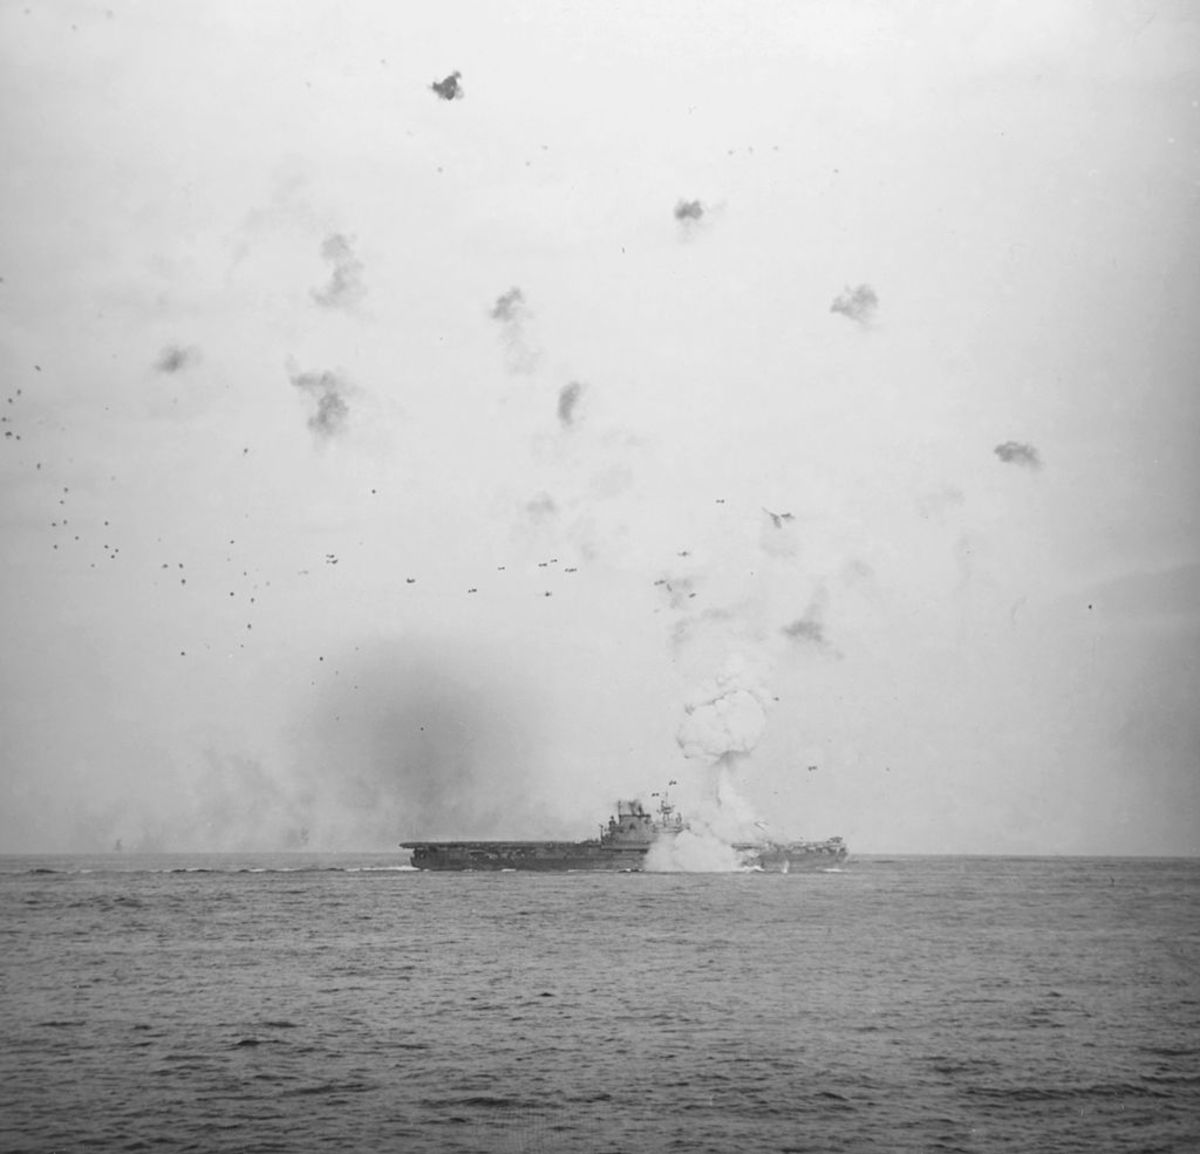 USS Enterprise Okinawa kamikaze attack a near miss.